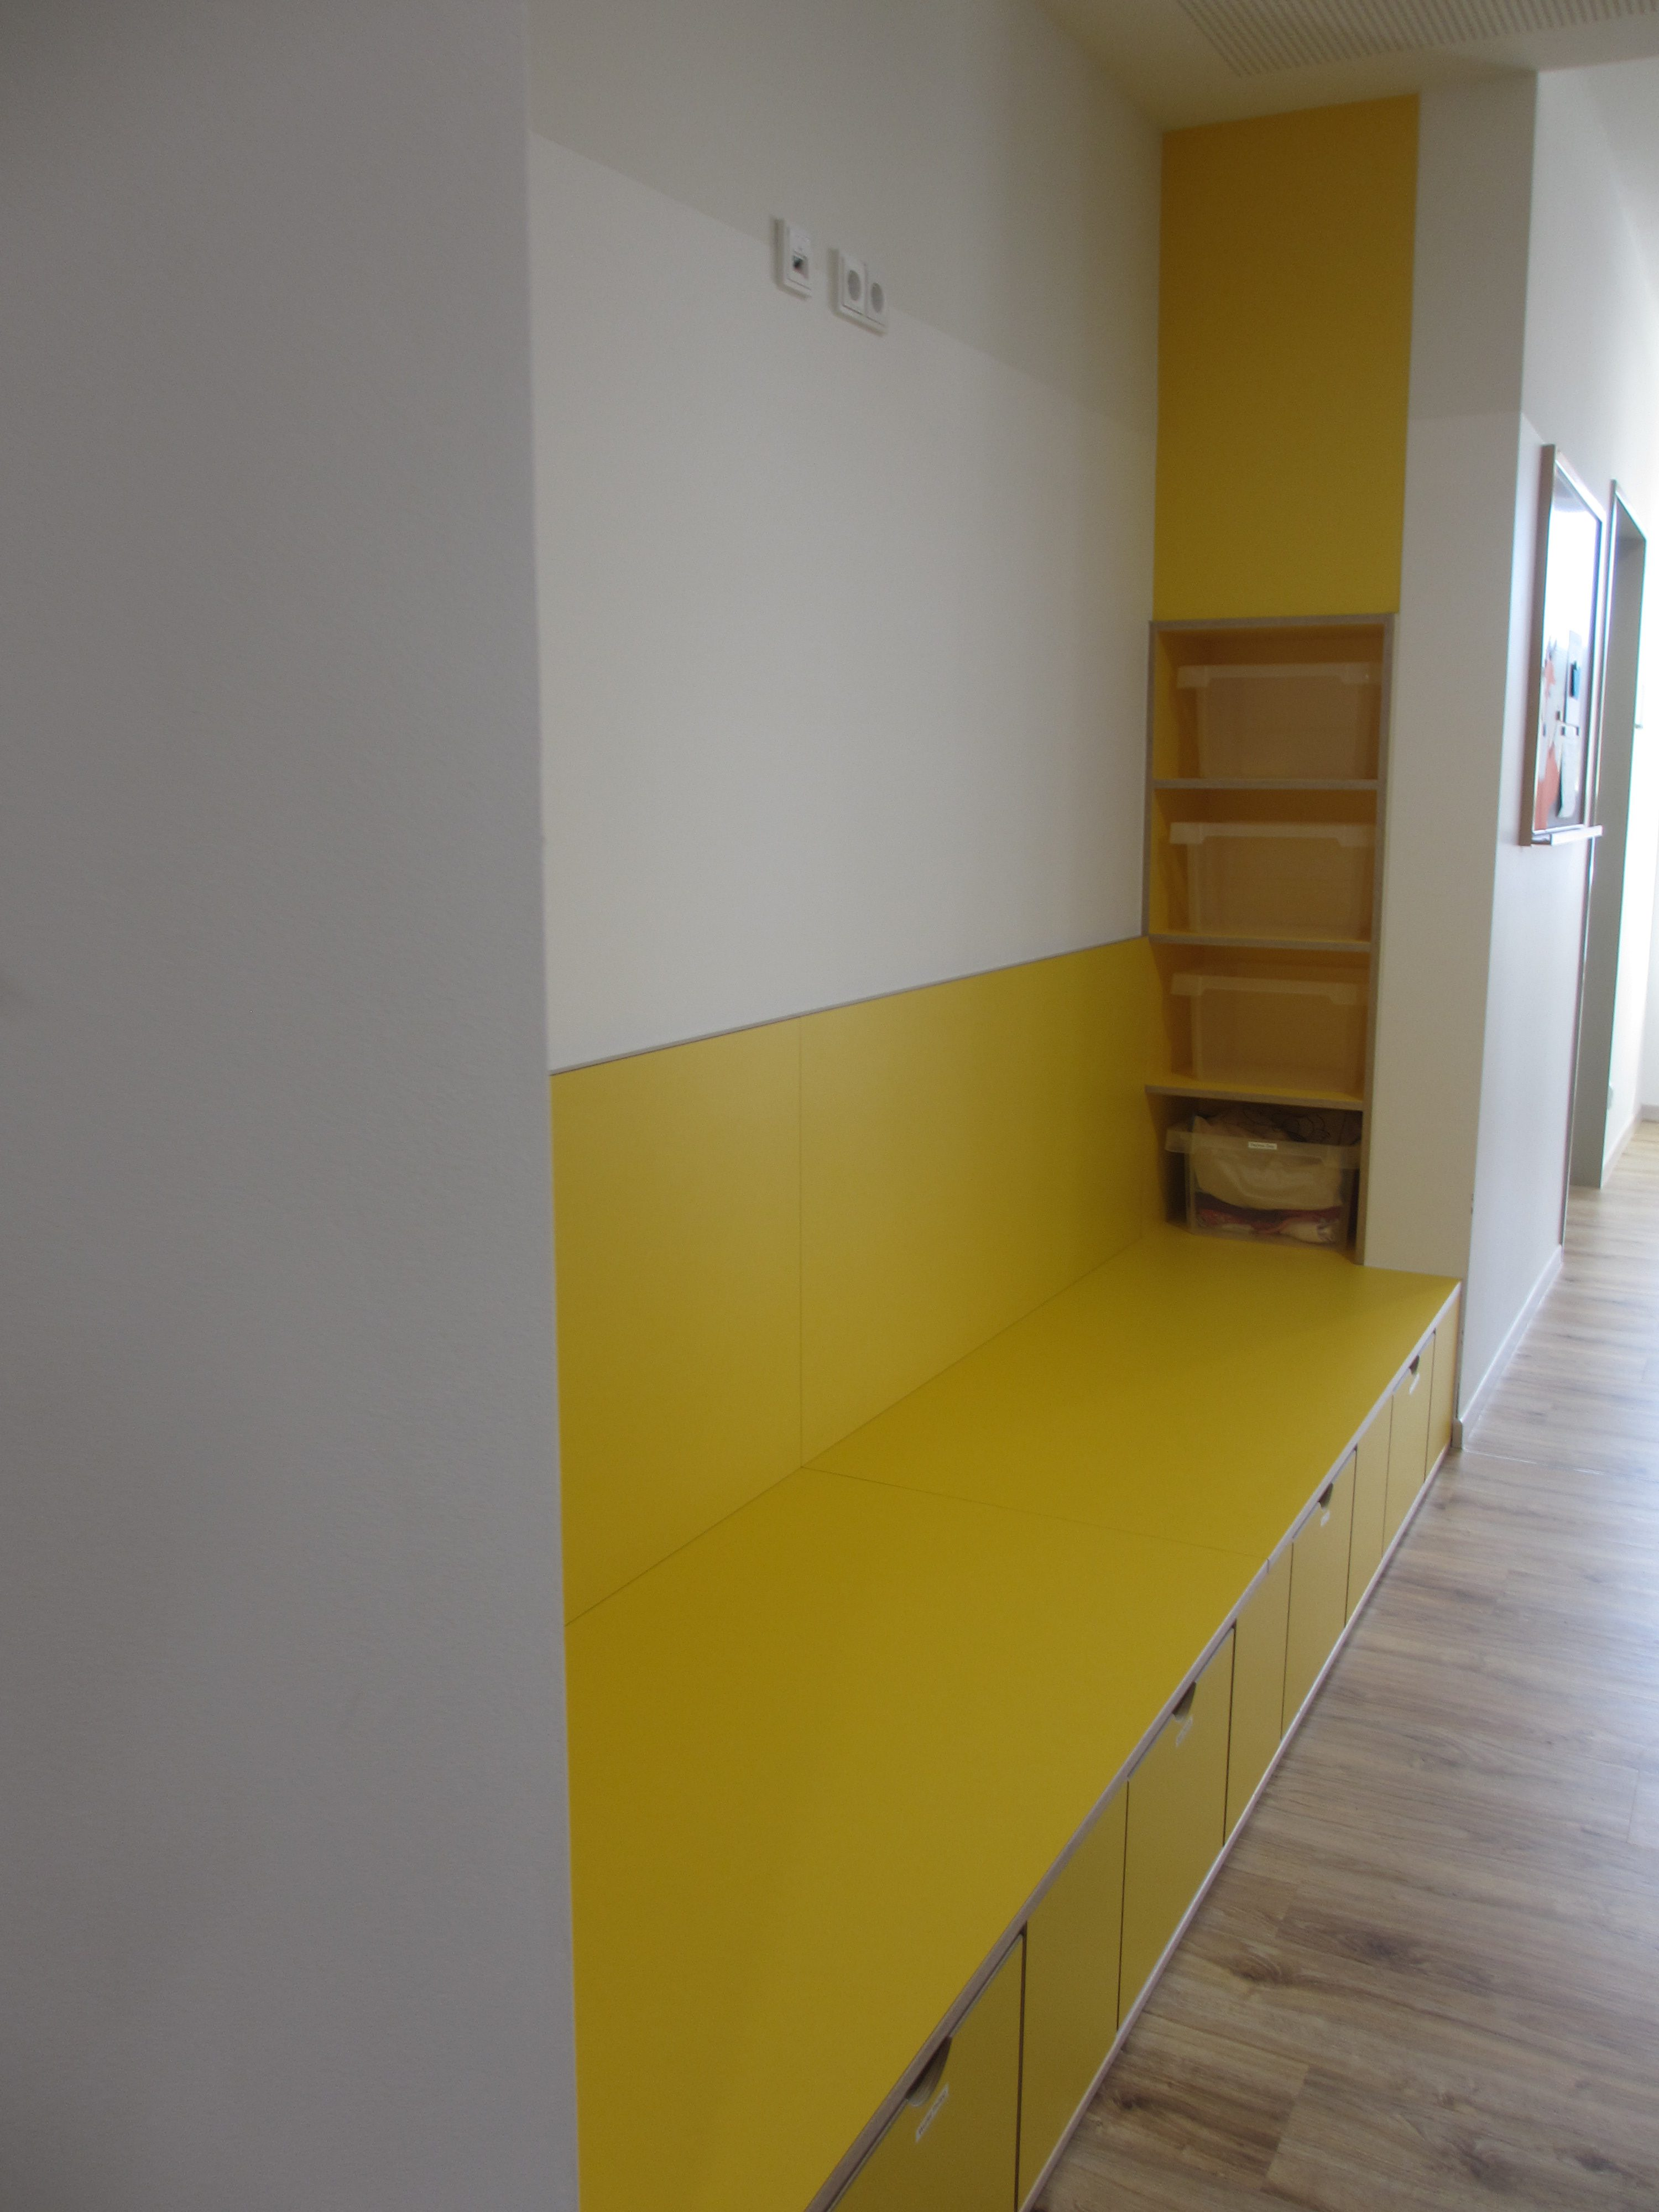 haindl kollegen architekten aktuelles. Black Bedroom Furniture Sets. Home Design Ideas